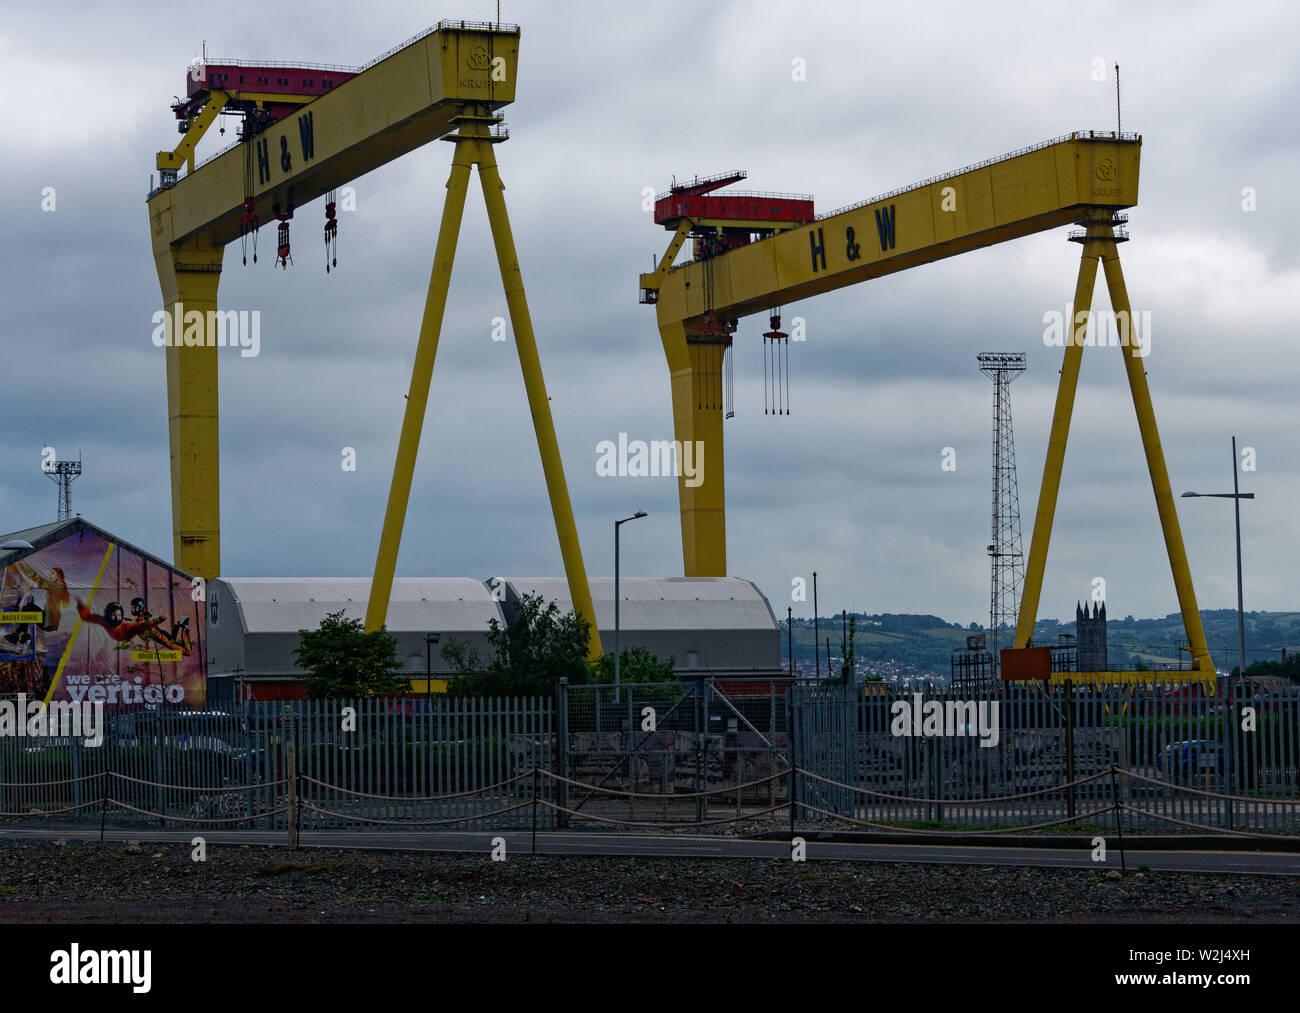 Belfast Titanic Museum and Visitor Centre, Belfast City, Northern Ireland - Stock Image